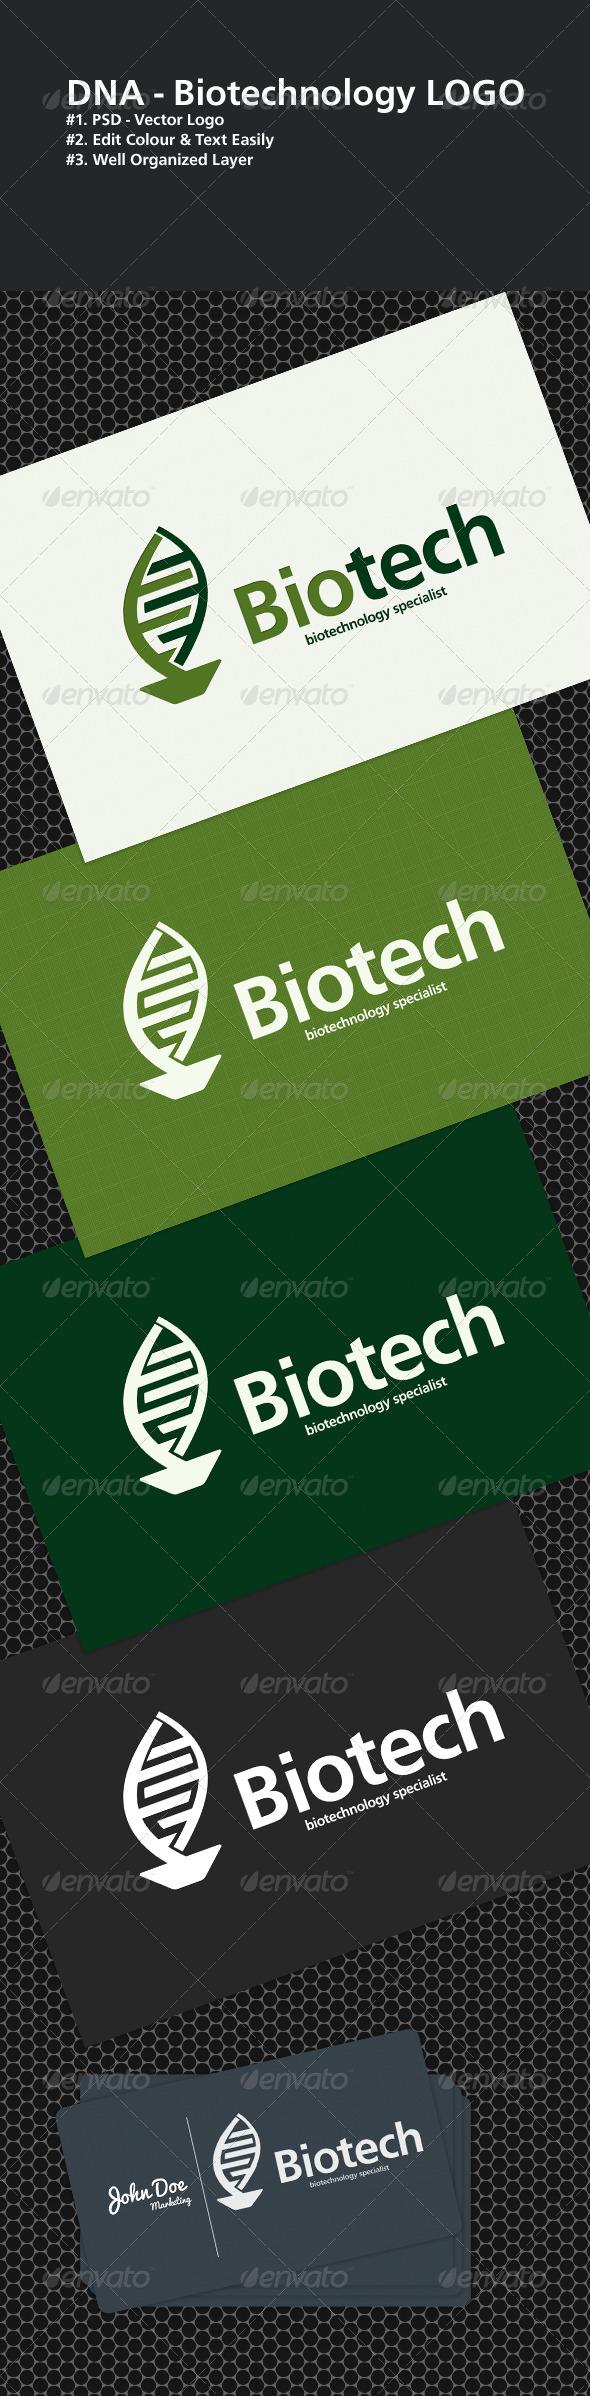 Biotech logo - Objects Logo Templates